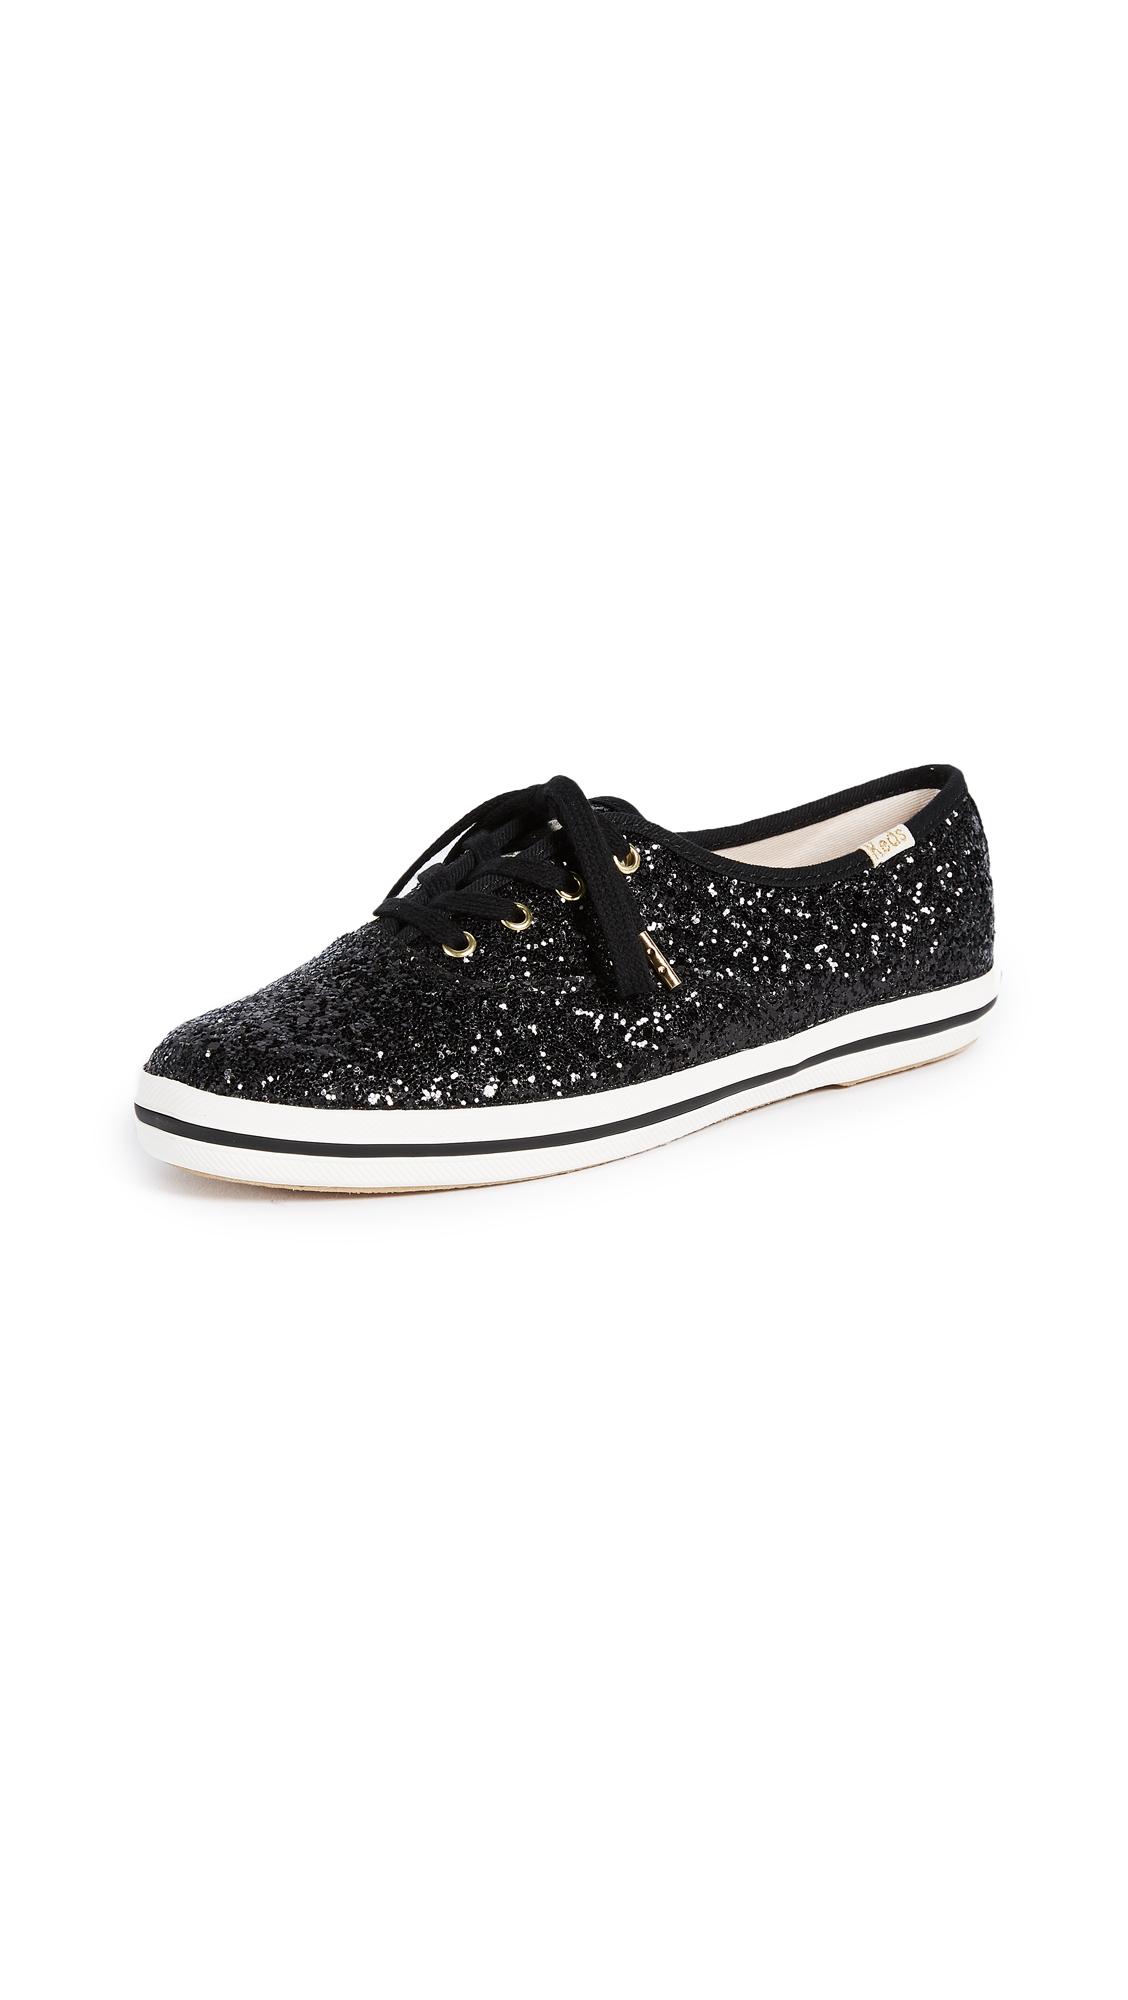 Keds x Kate Spade New York Glitter Sneakers - Black